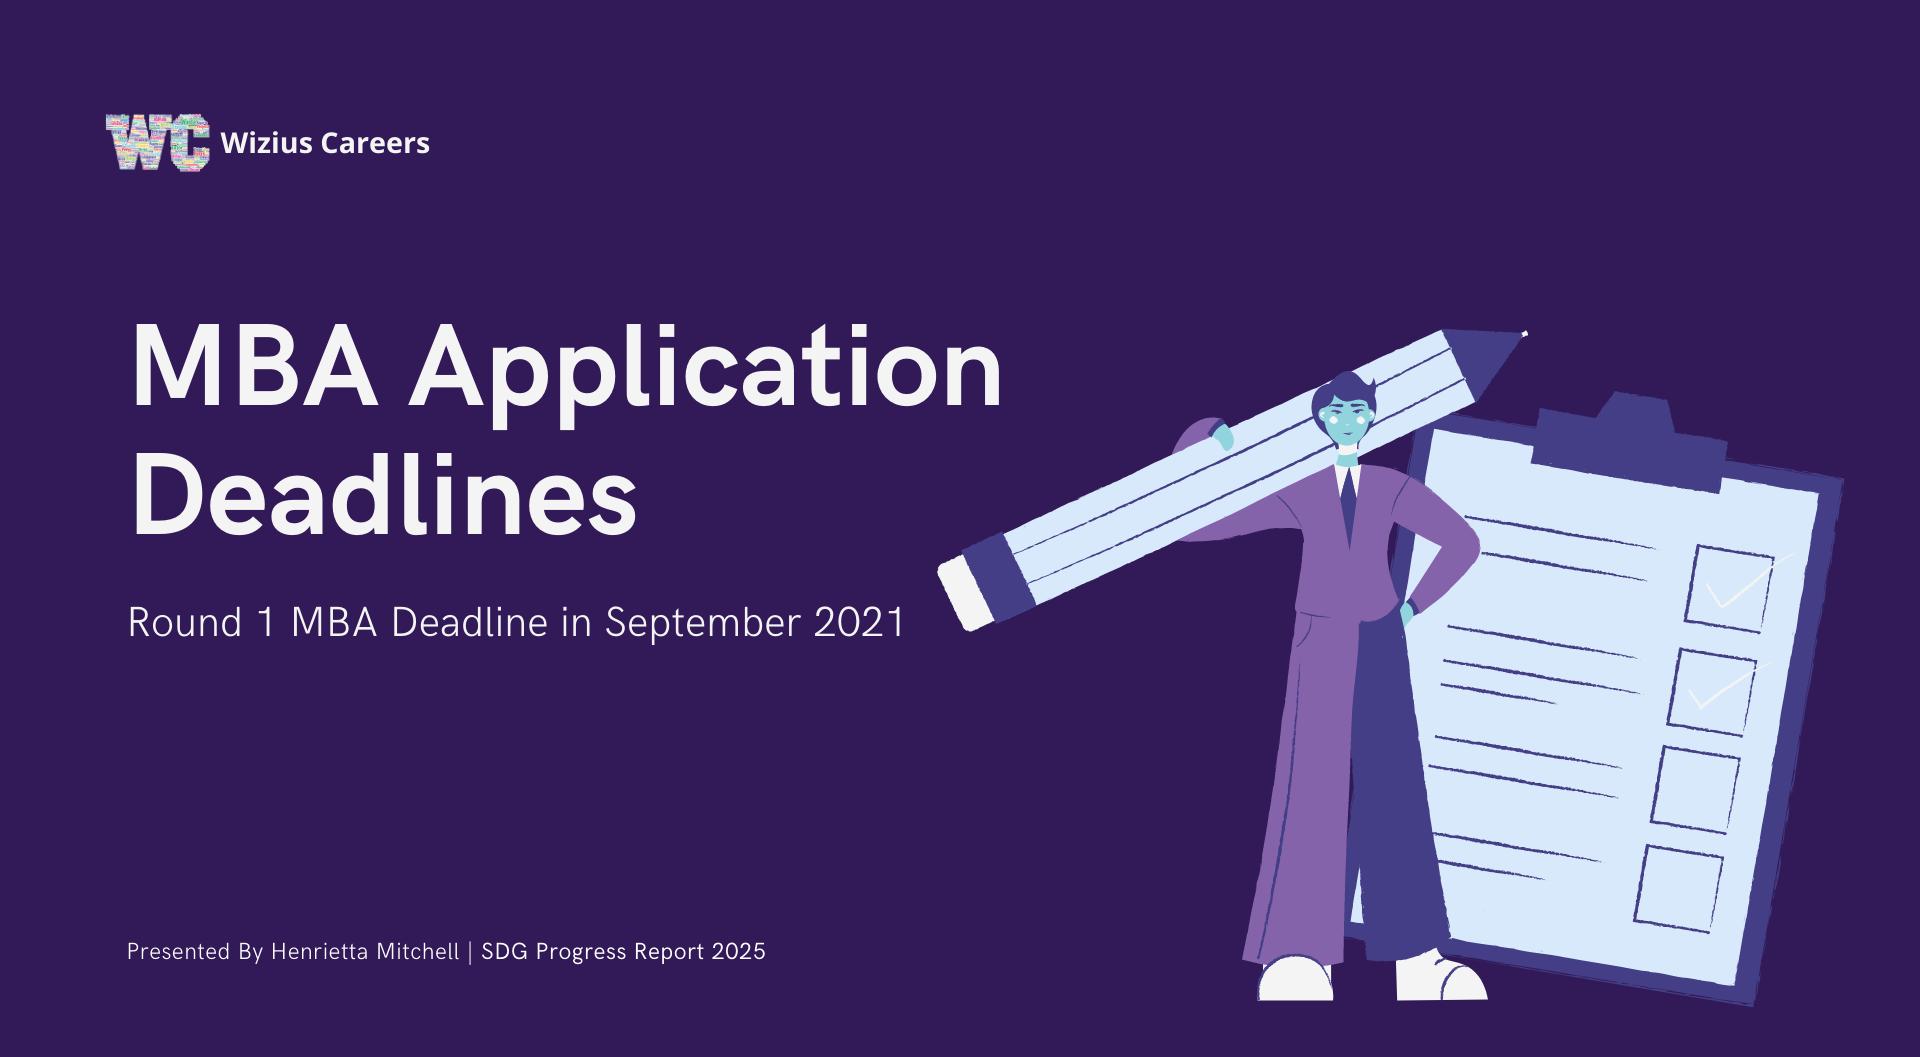 MBA Application Deadlines Round 1